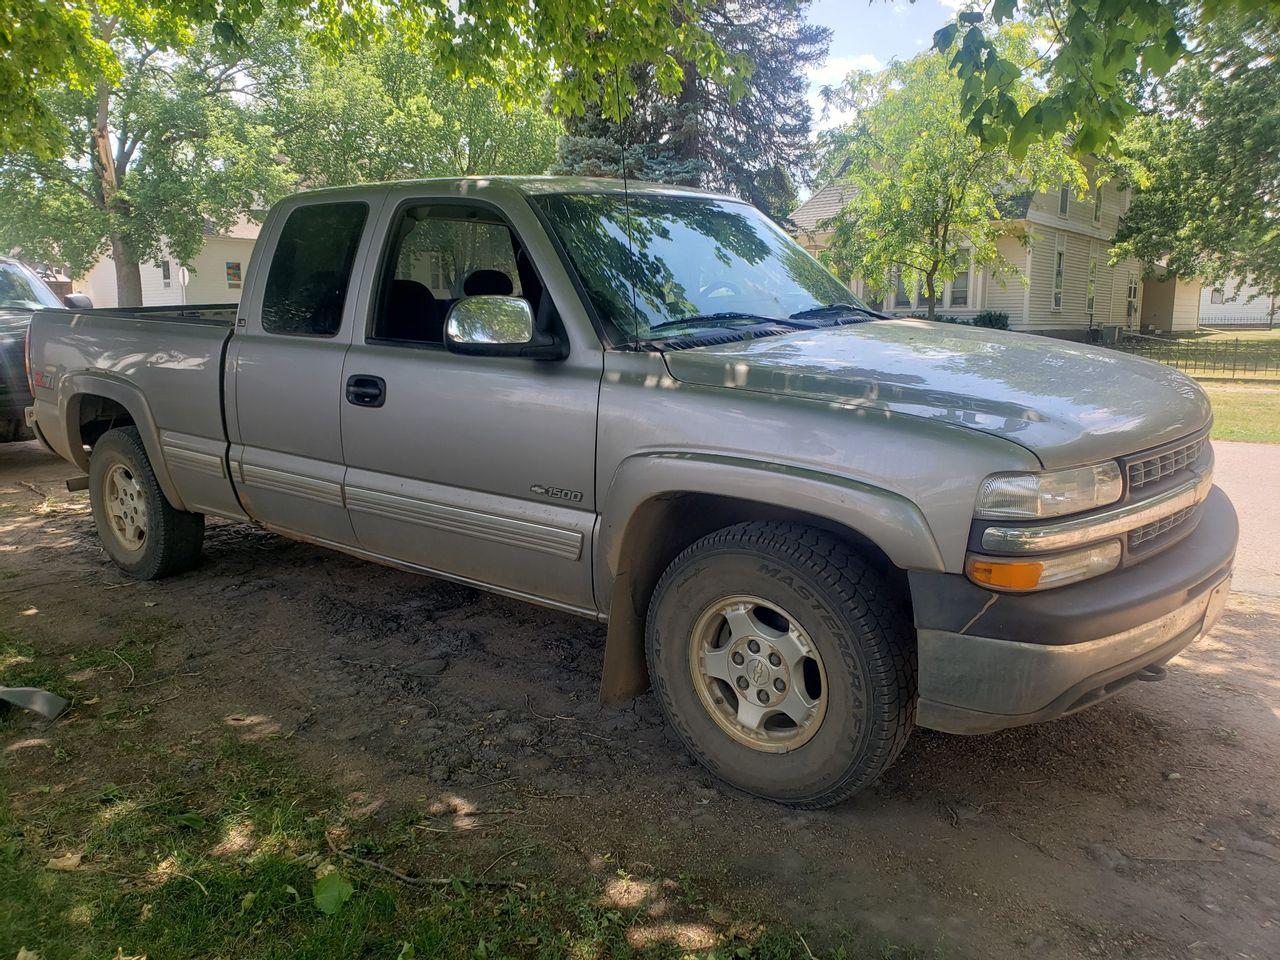 2000 Chevrolet Silverado 1500 LS | Hurley, SD, Light Pewter Metallic (Gray), 4 Wheel